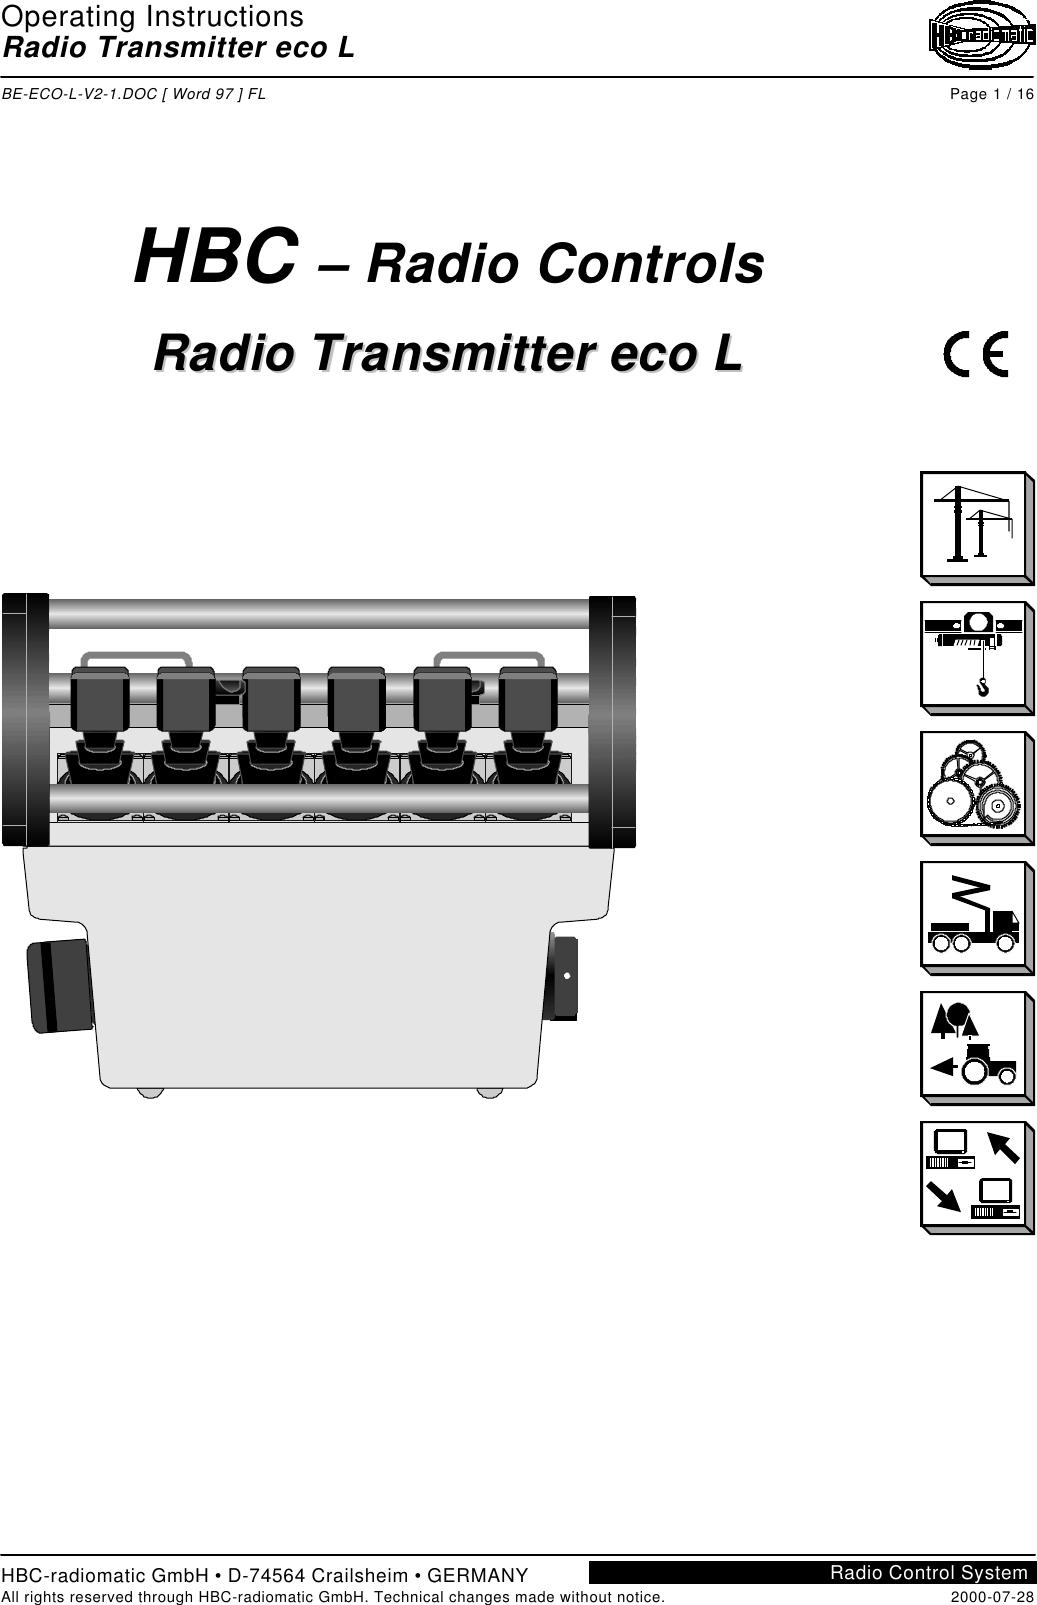 Hbc Radiomatic E Crane Remote Control Transmitter